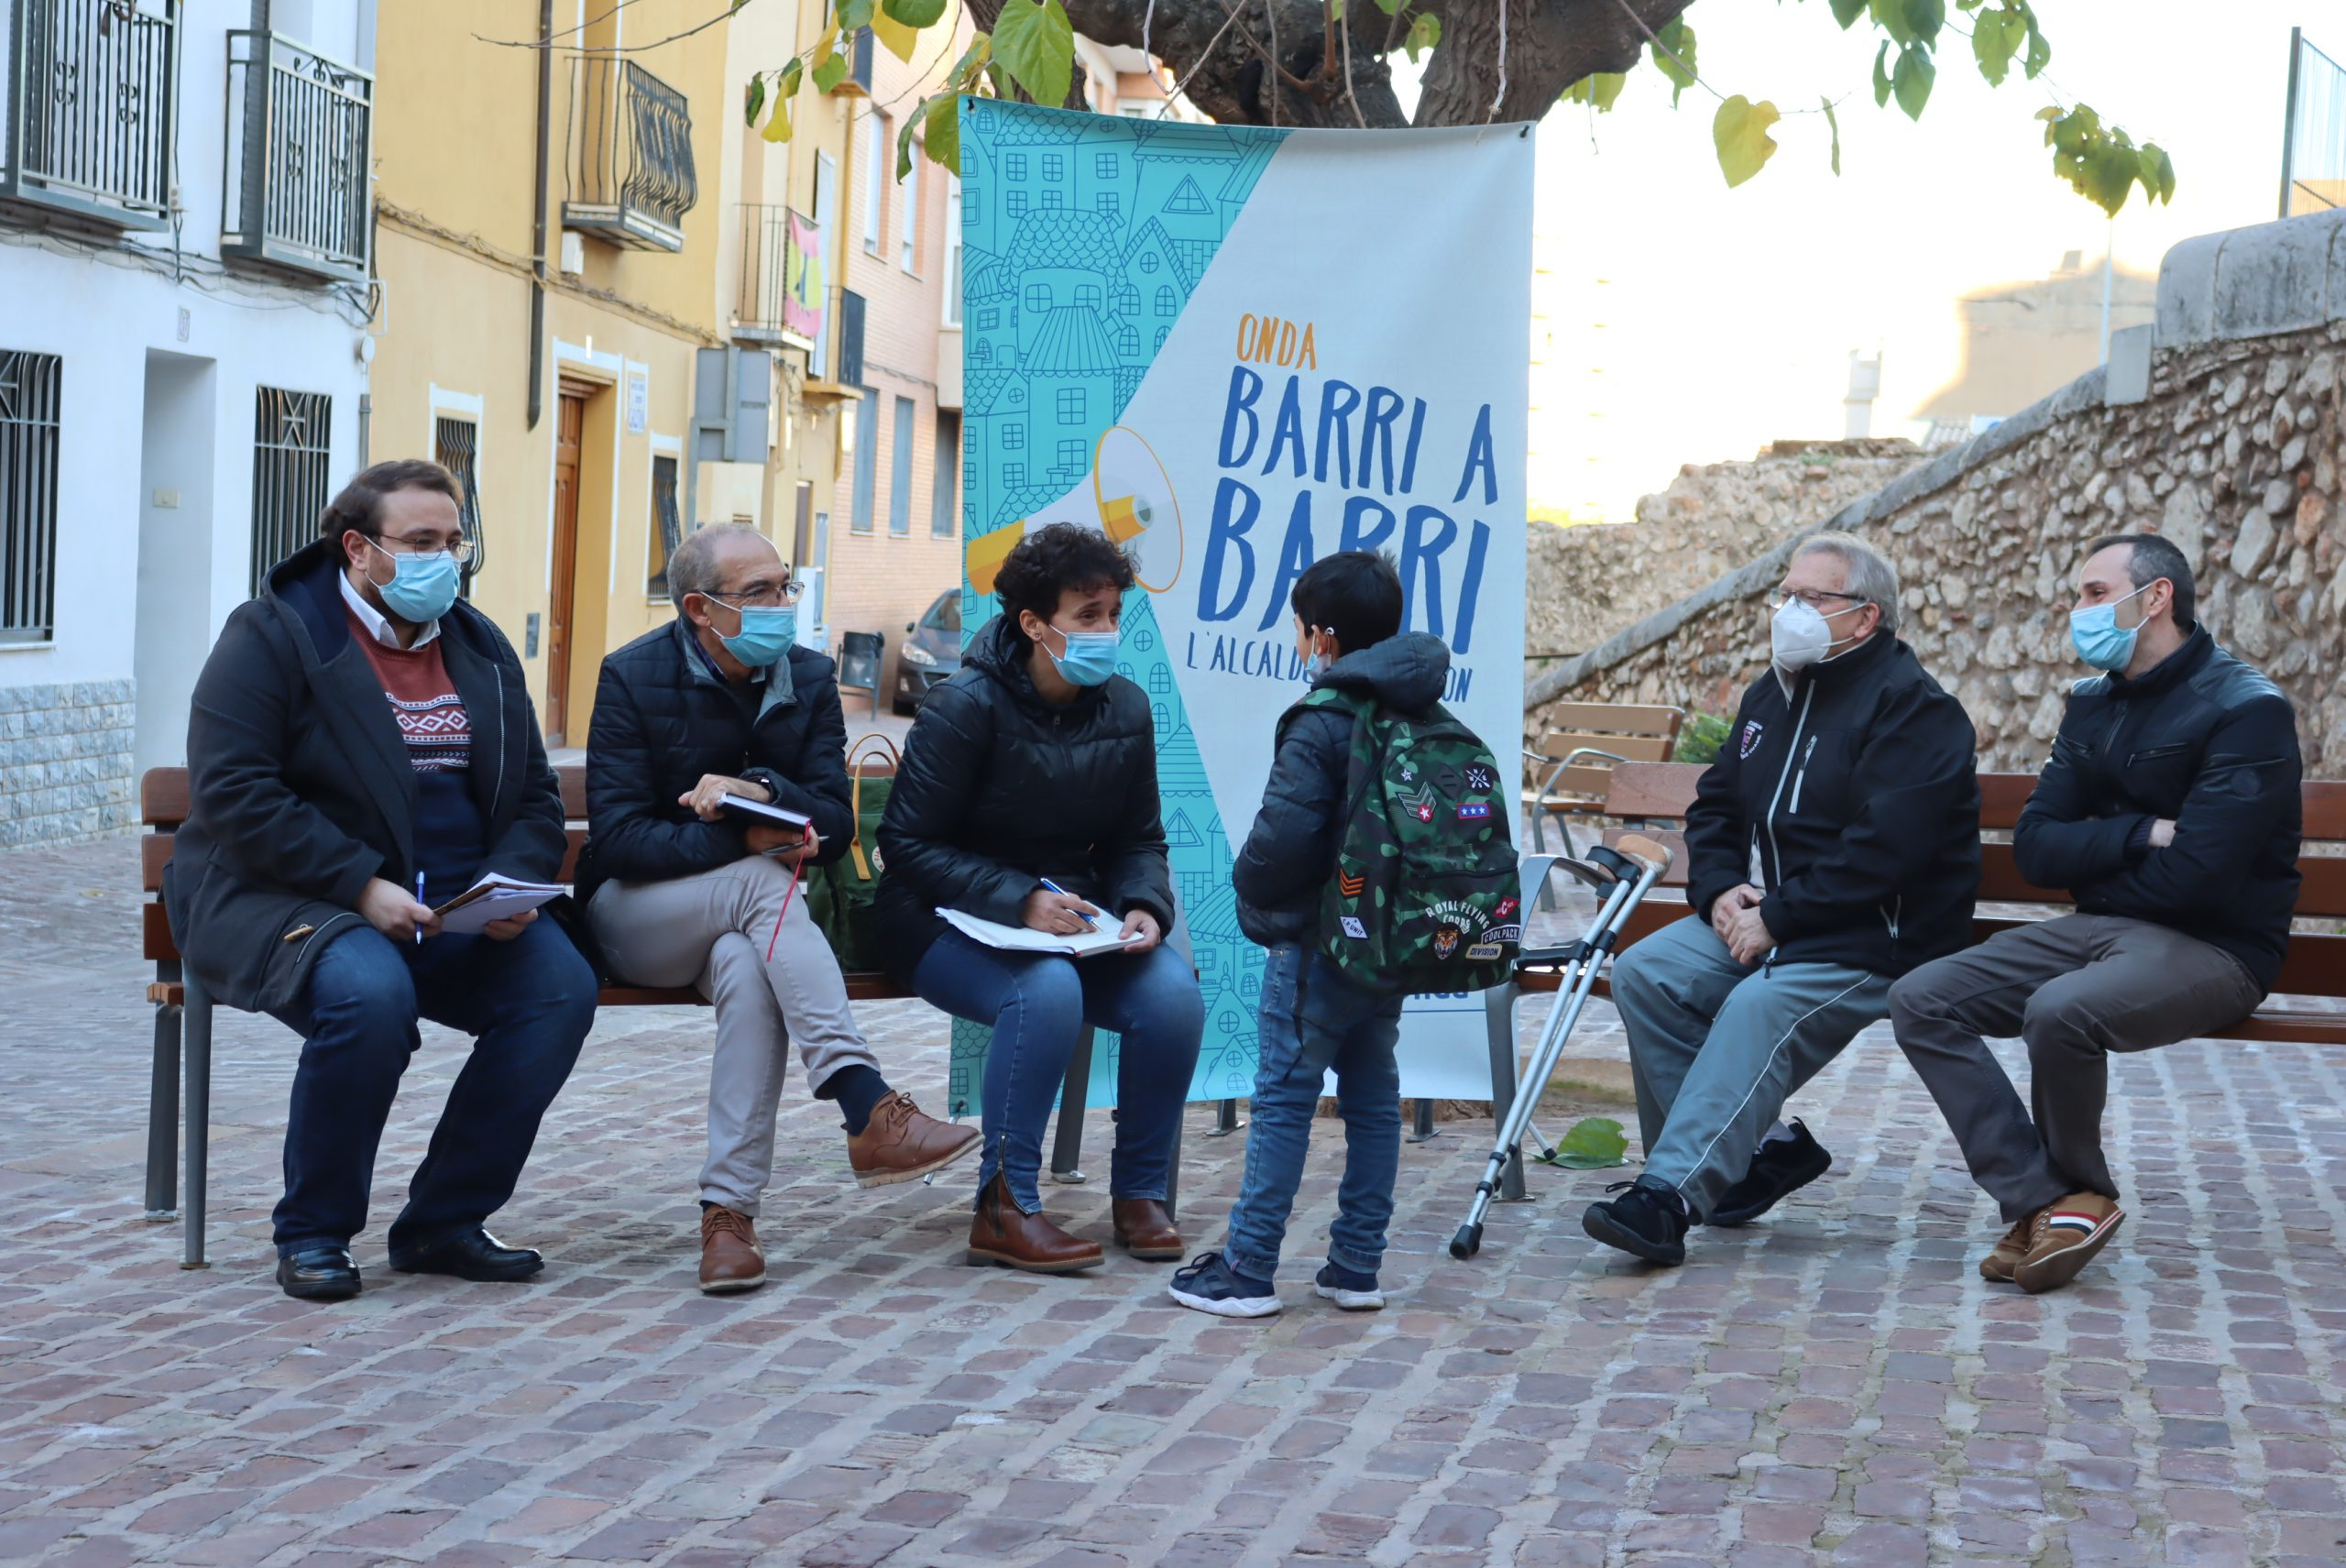 El equipo de Ballester regresa a las plazas para reactivar la campaña de escucha ciudadana 'Onda barri a barri'